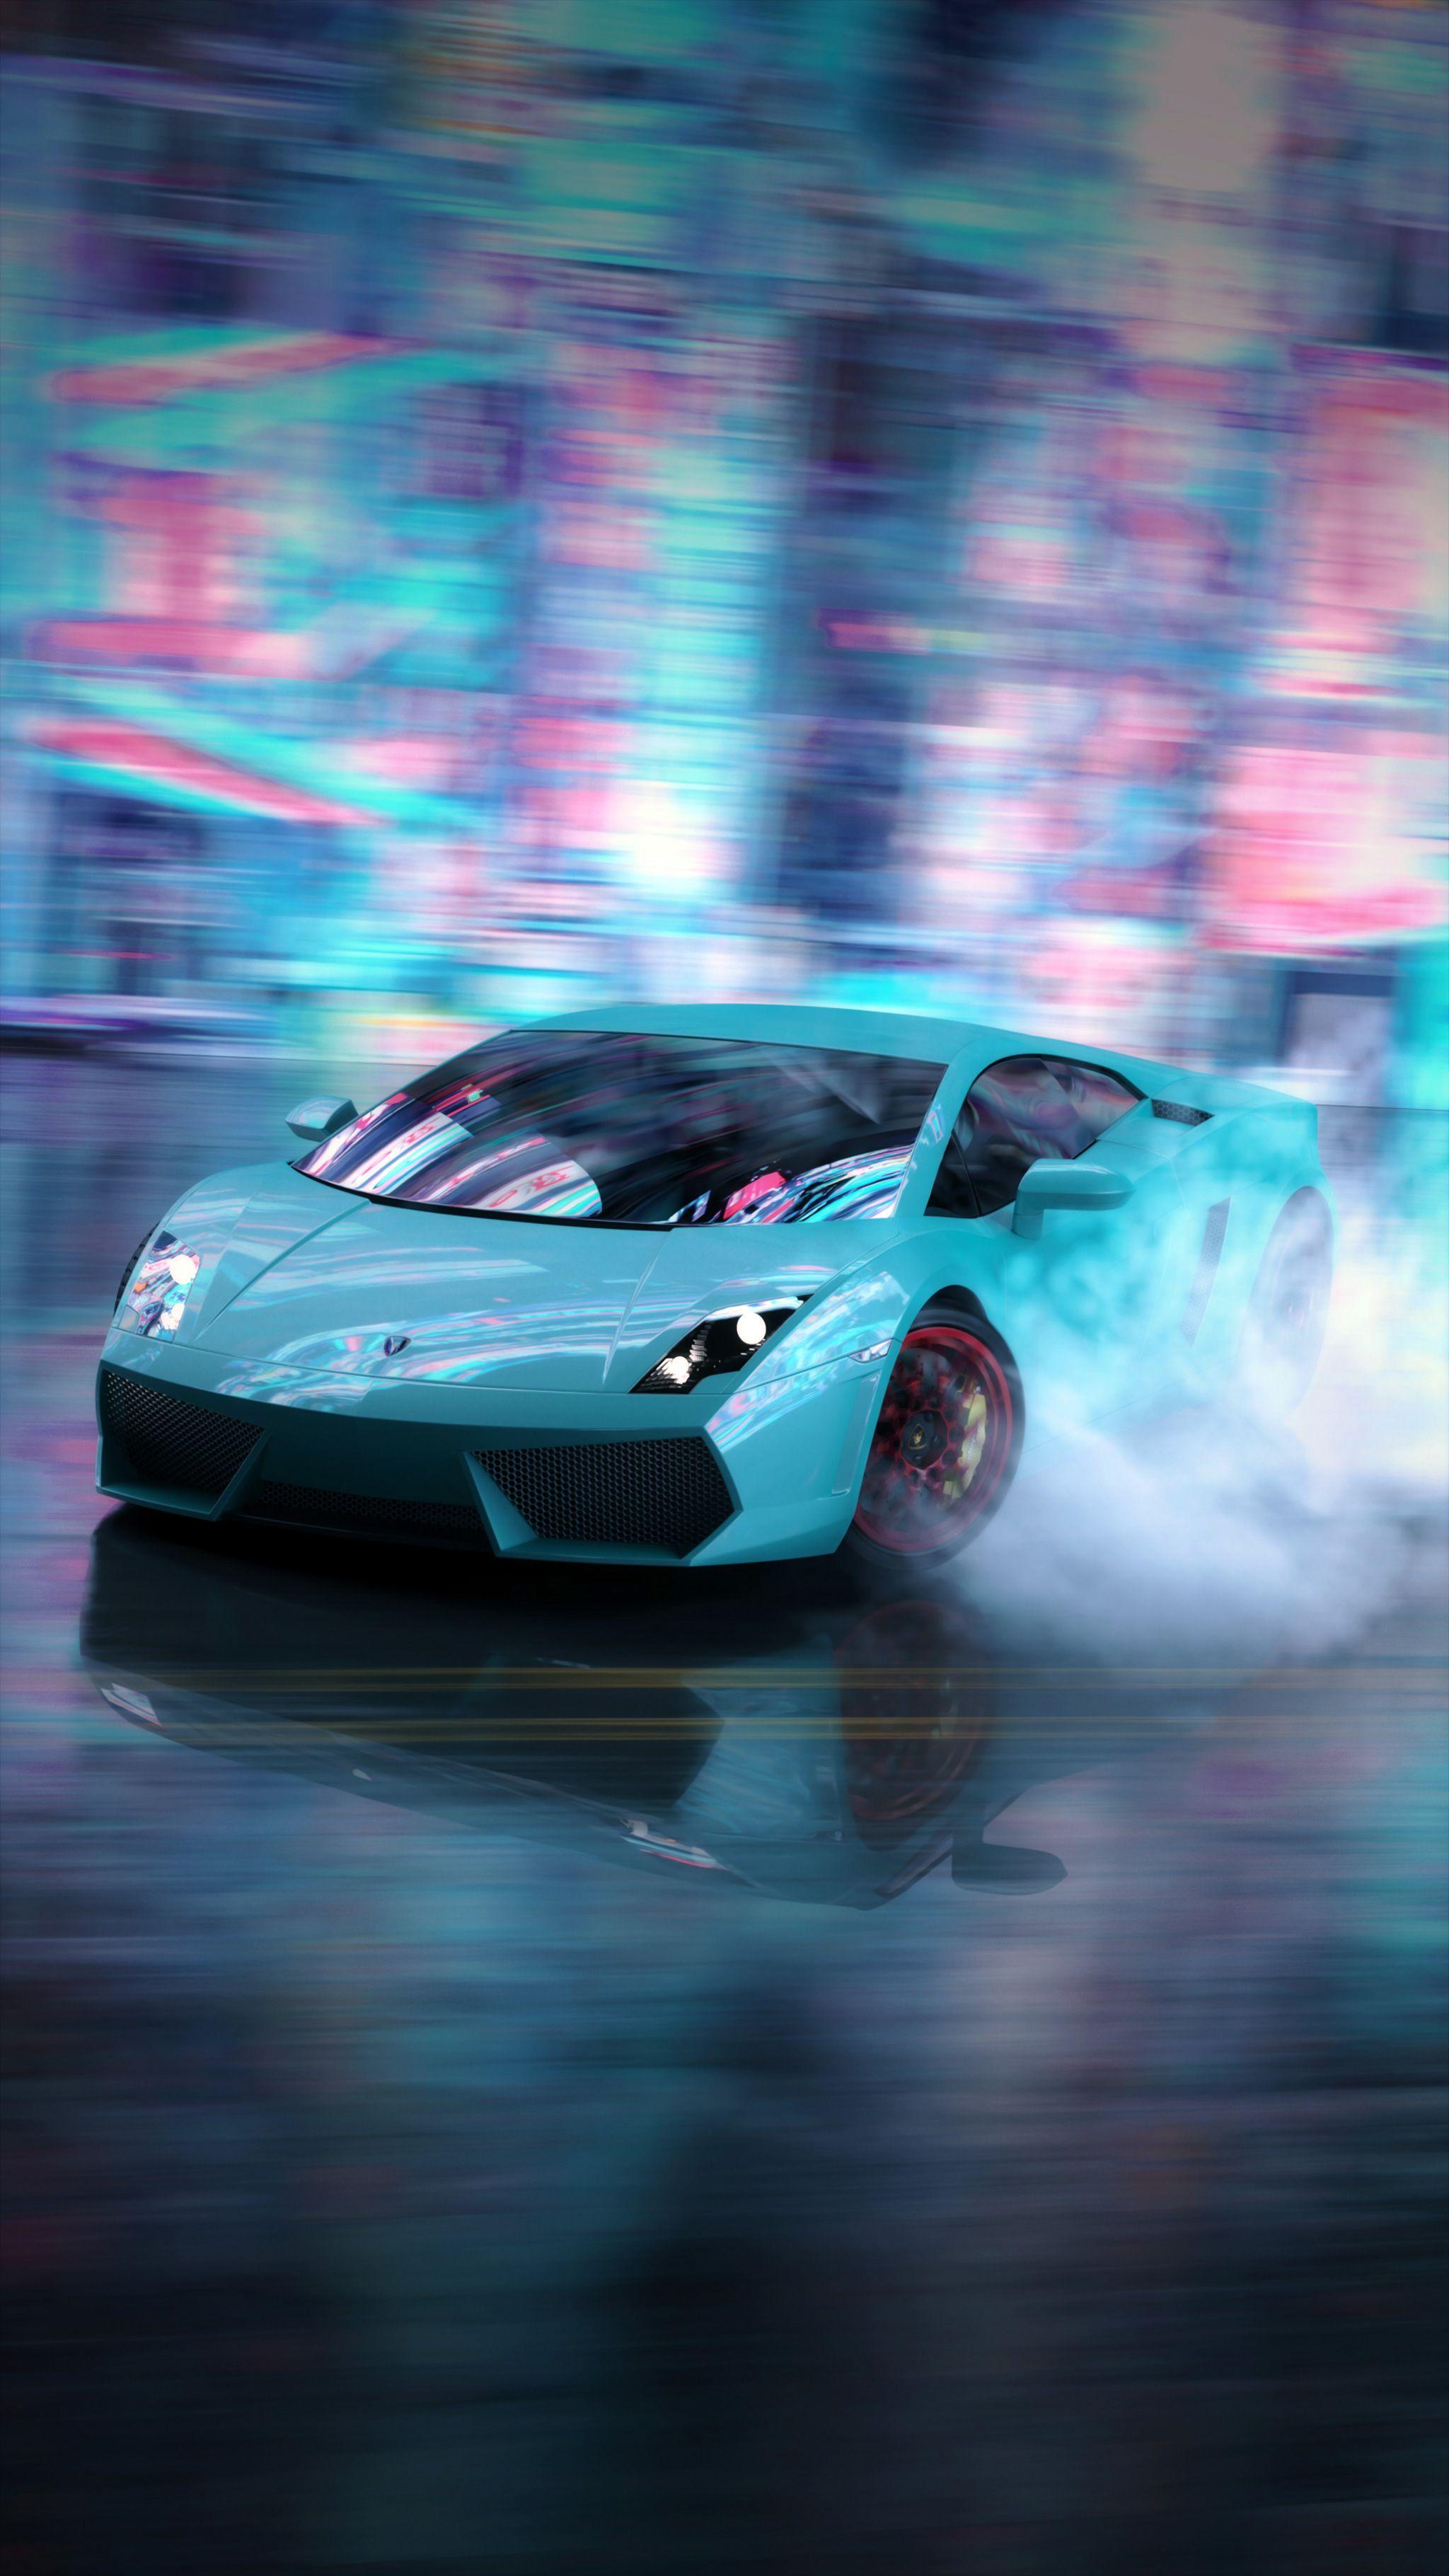 Pin By Erick Milando On App Lamborghini Wallpaper Iphone Car Iphone Wallpaper Car Wallpapers